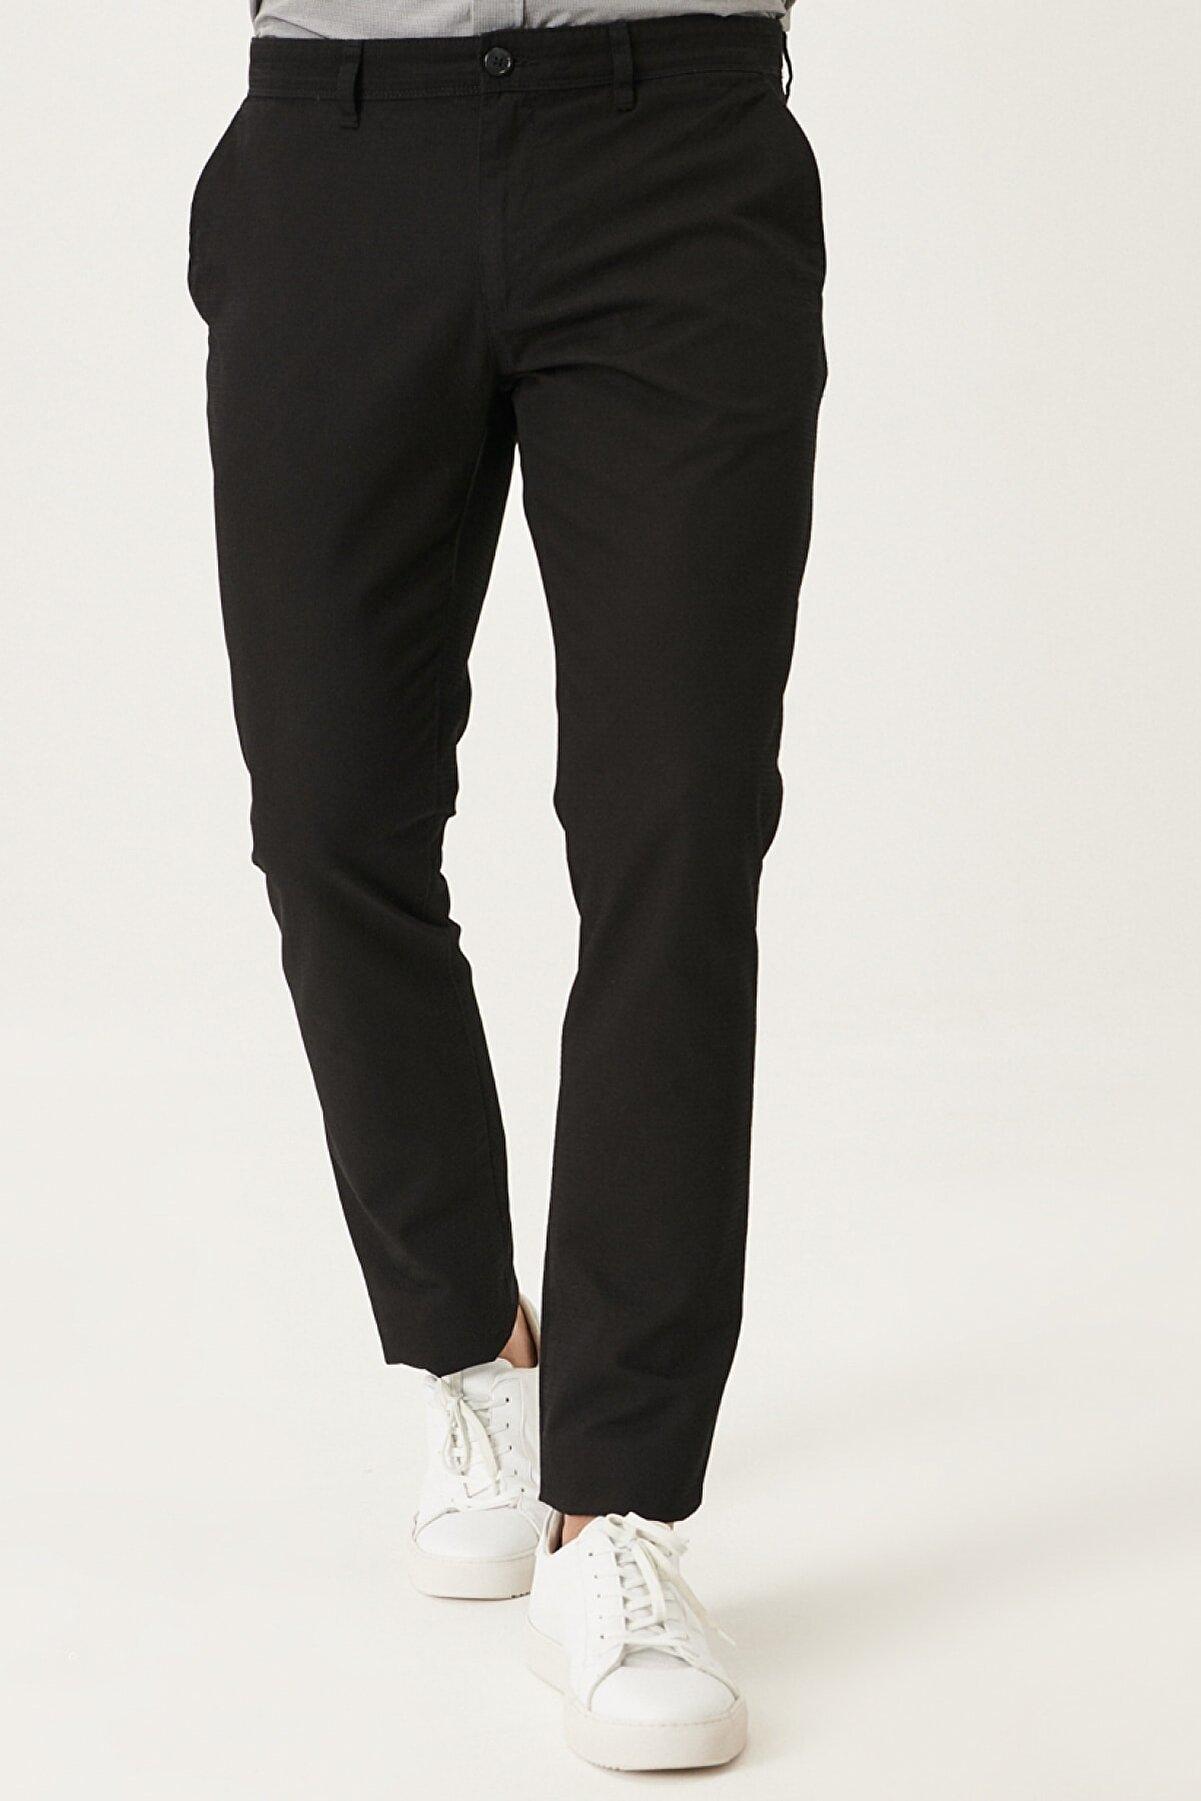 Altınyıldız Classics Kanvas Slim Fit Dar Kesim Yan Cep %100 Koton Chino Pantolon